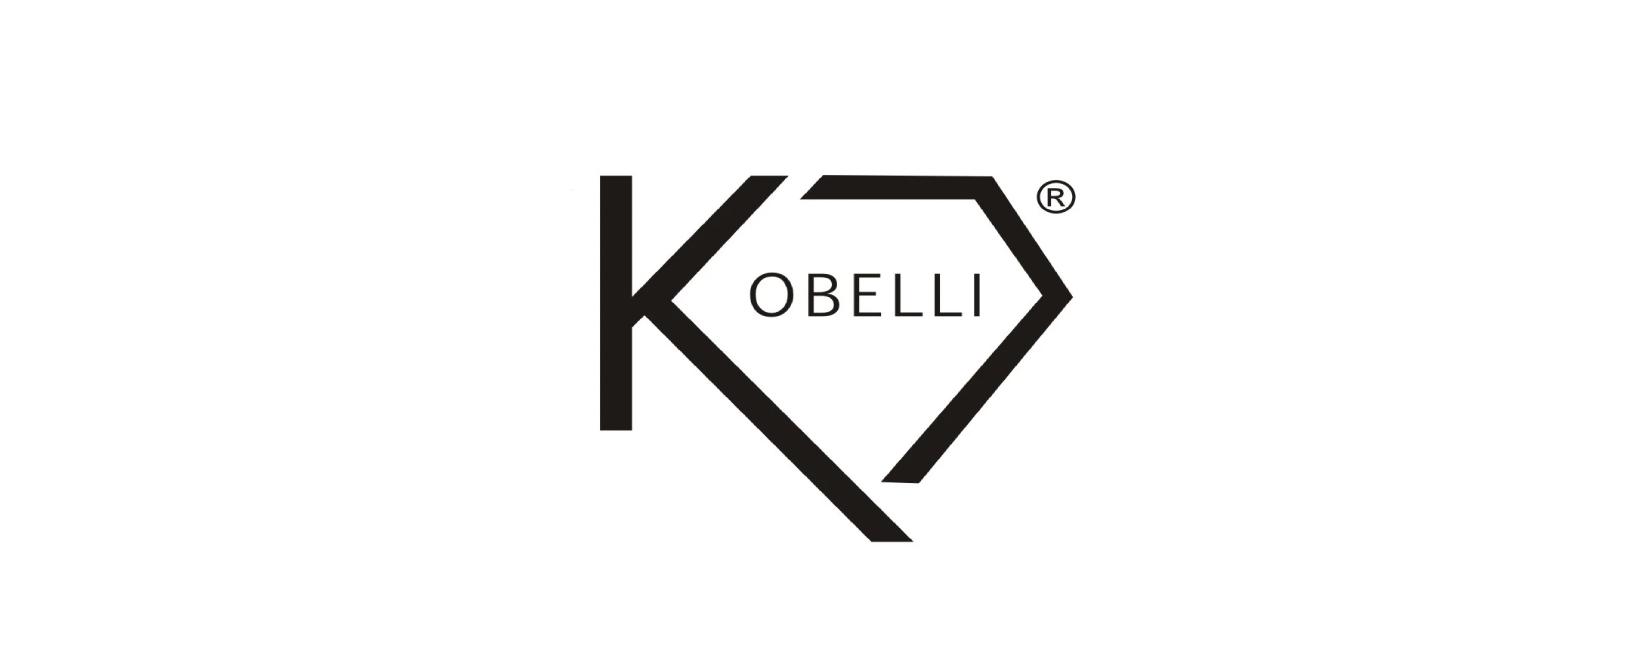 kobelli Coupon Code 2021